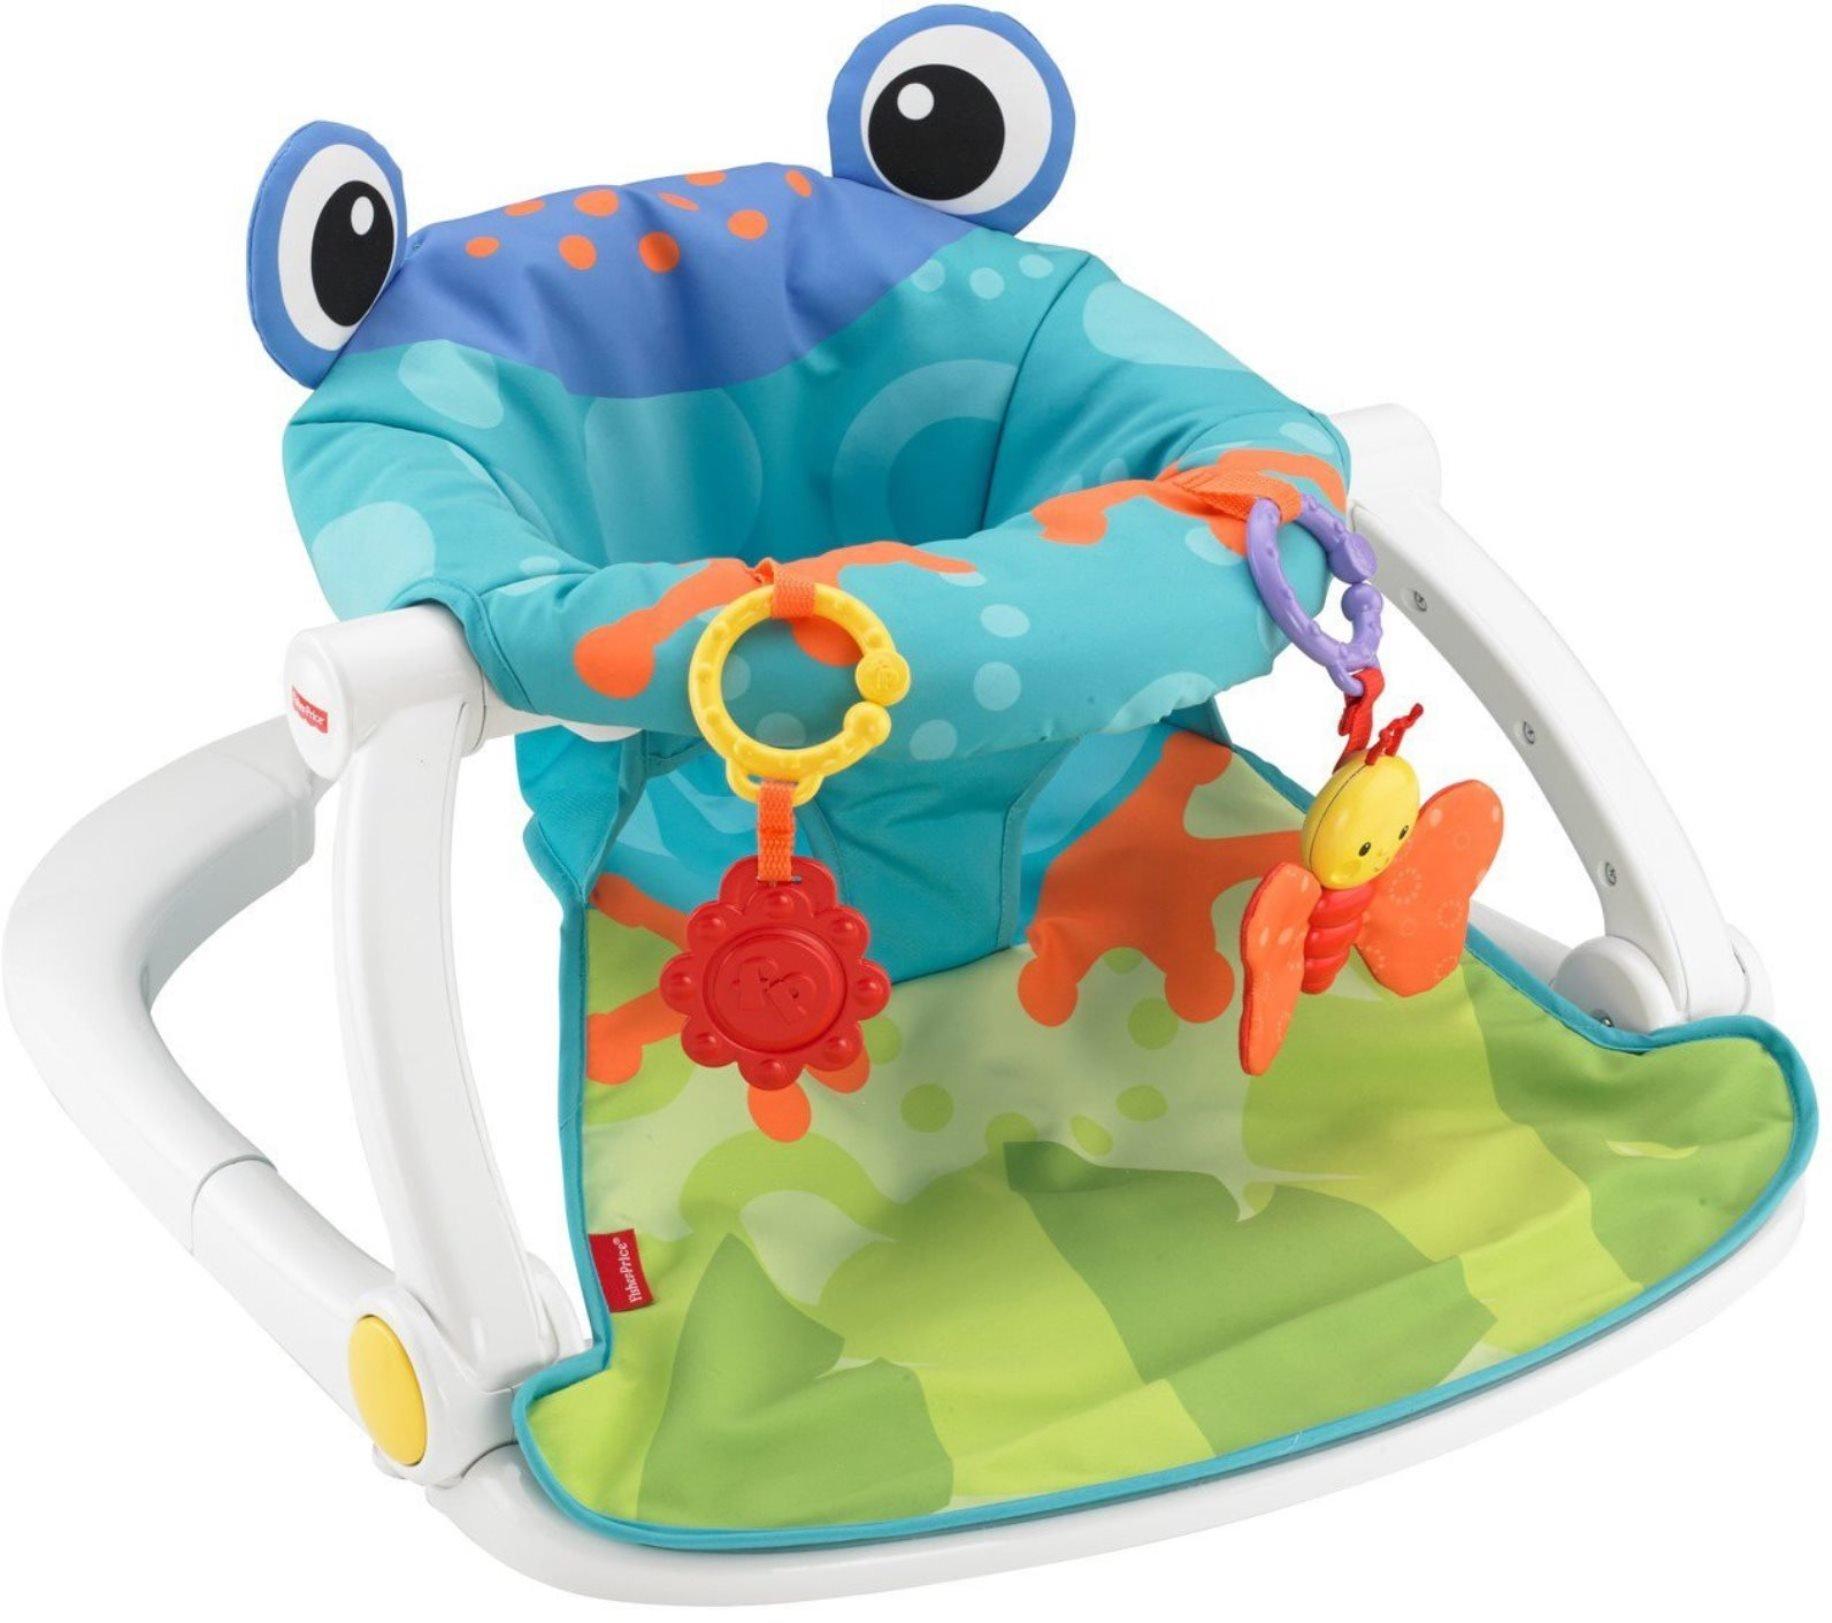 Amazon.com : Fisher-Price Deluxe Sit-Me-Up Floor Seat : Infant ...